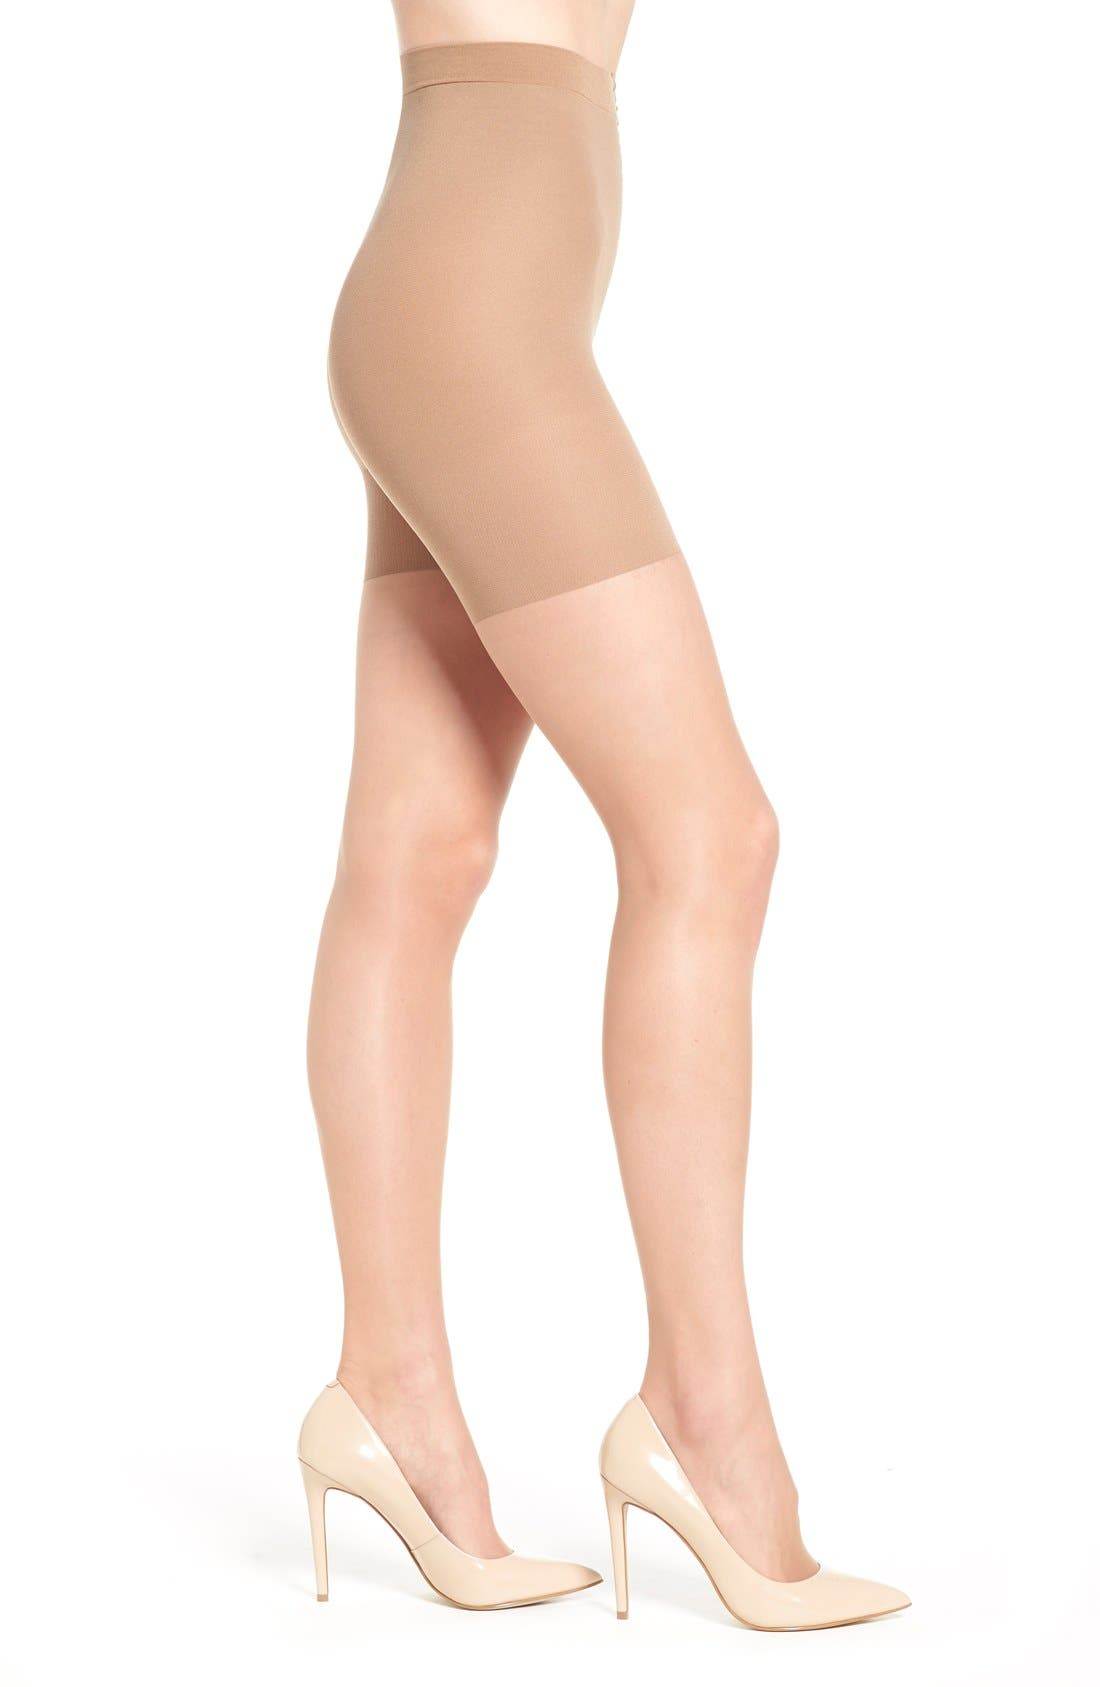 Luxe Leg Pantyhose,                             Main thumbnail 1, color,                             NUDE 4